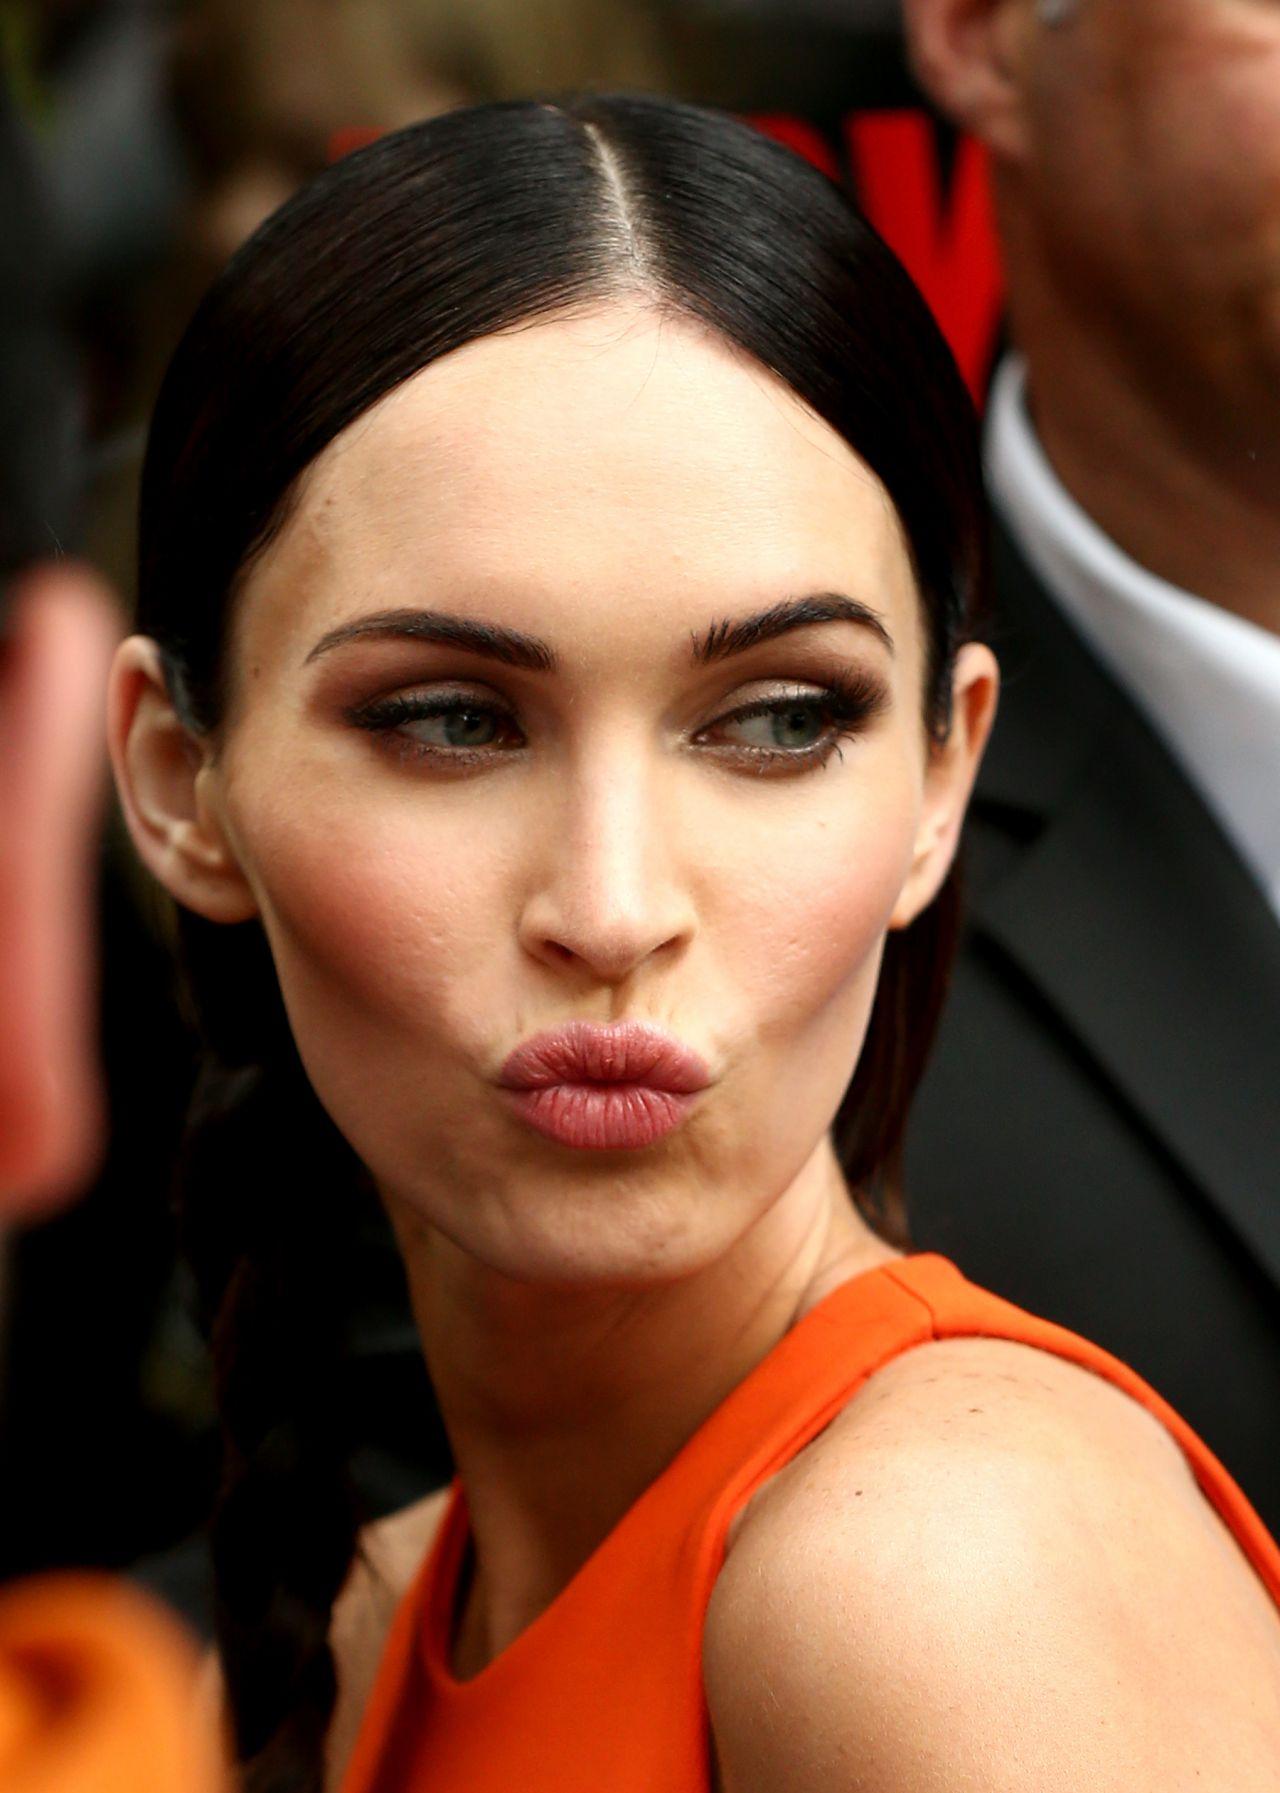 Megan Fox Teenage Mutant Ninja Turtles Premiere In Sydney